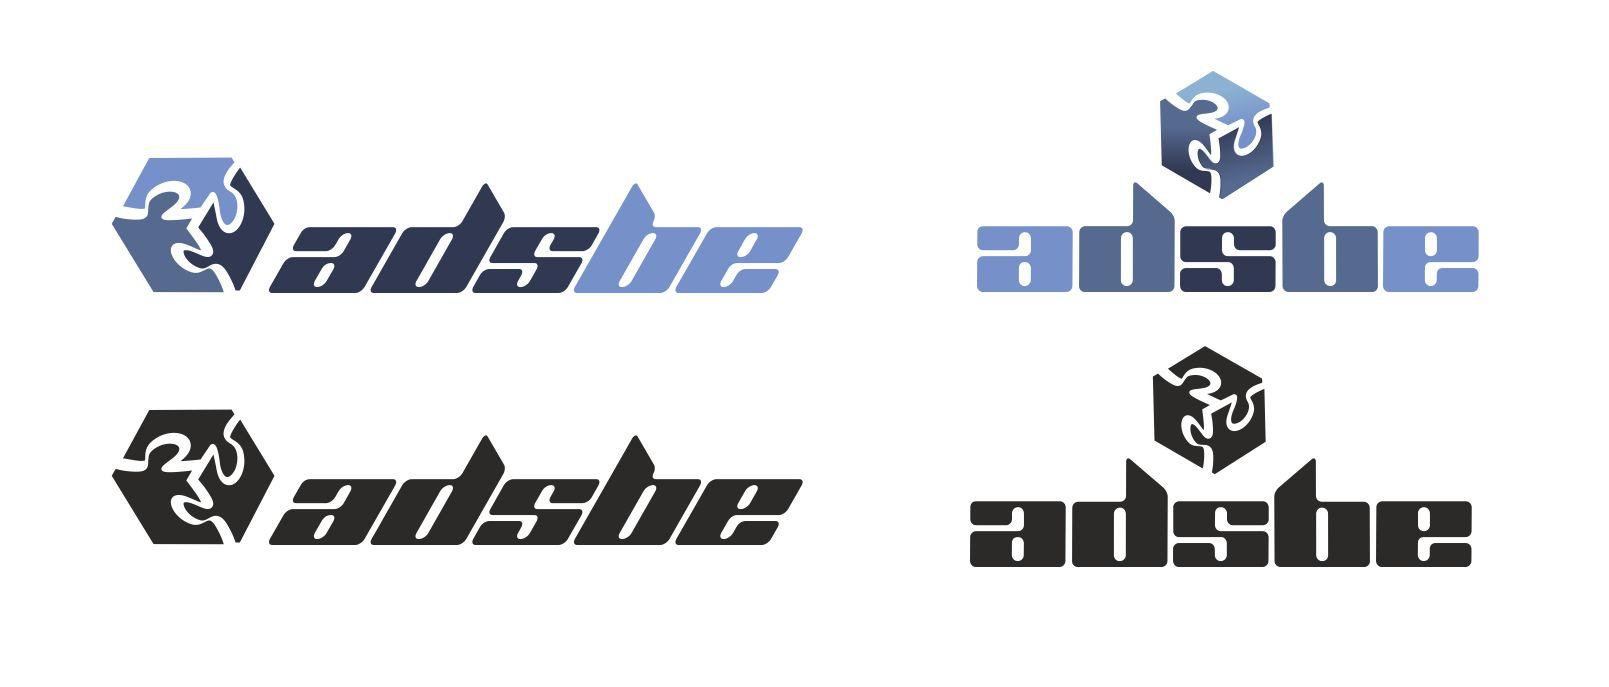 Разработка логотипа для CPA-сети фото f_8665882404a267ce.jpg